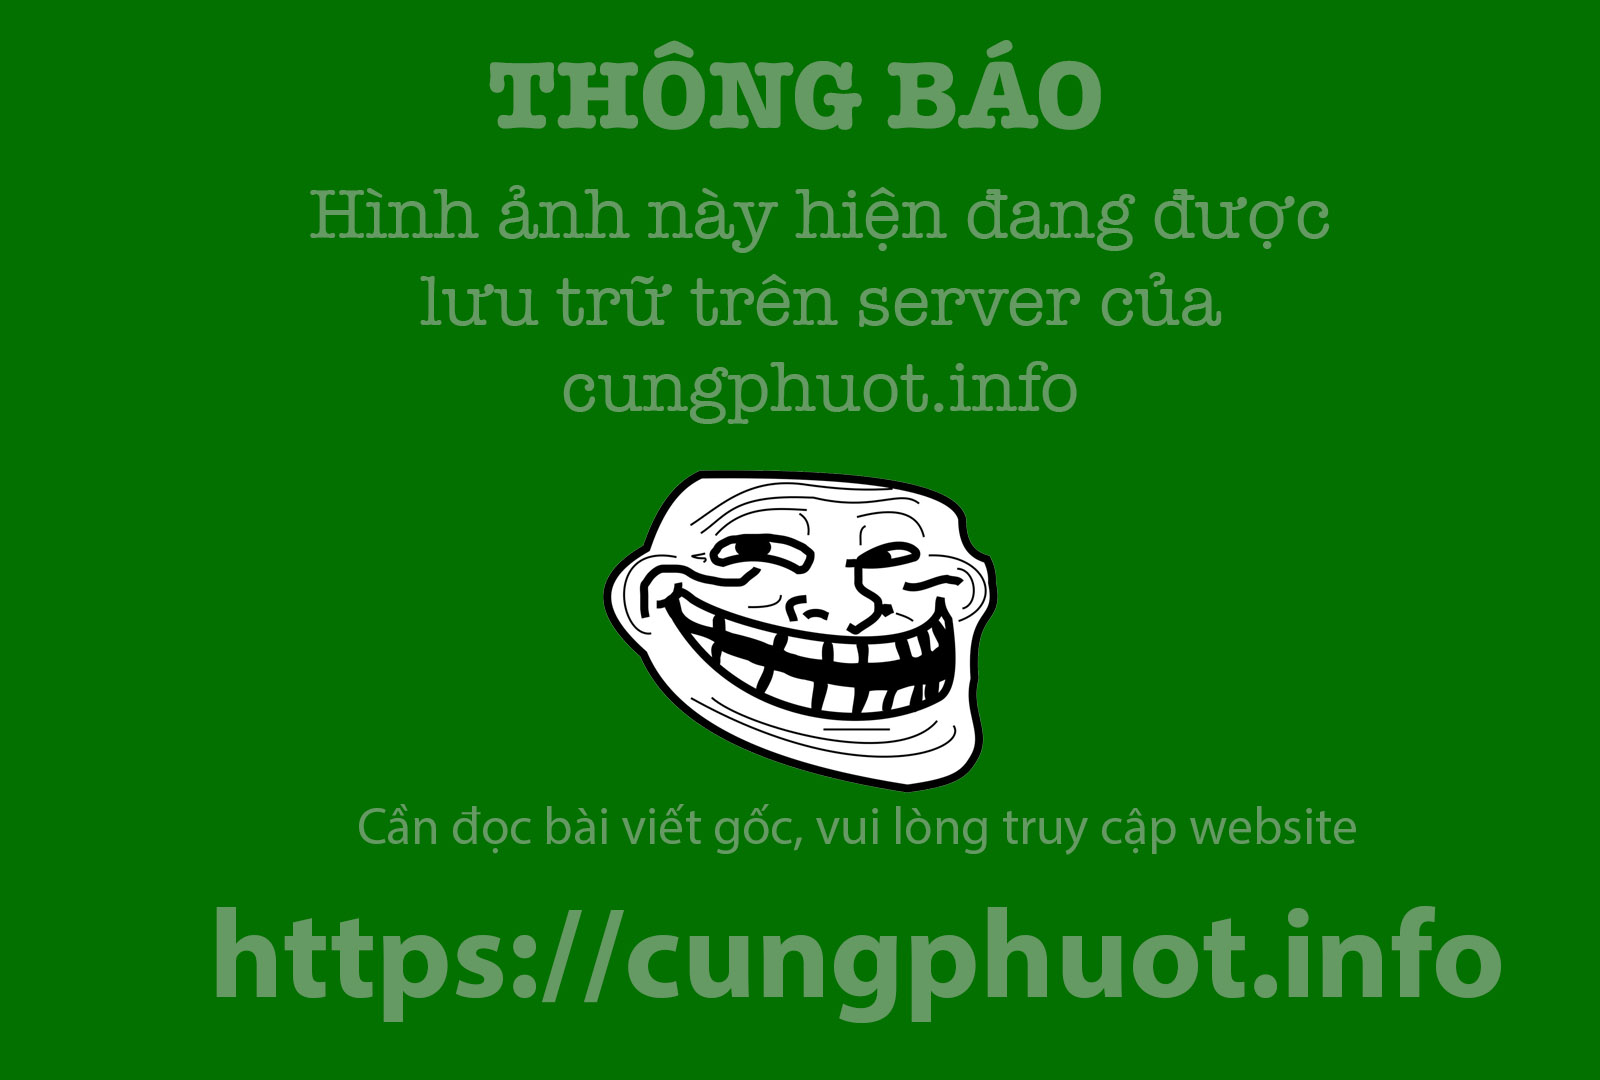 Chon bien cuong 'troi thap, dat cao' o Nam Can hinh anh 11